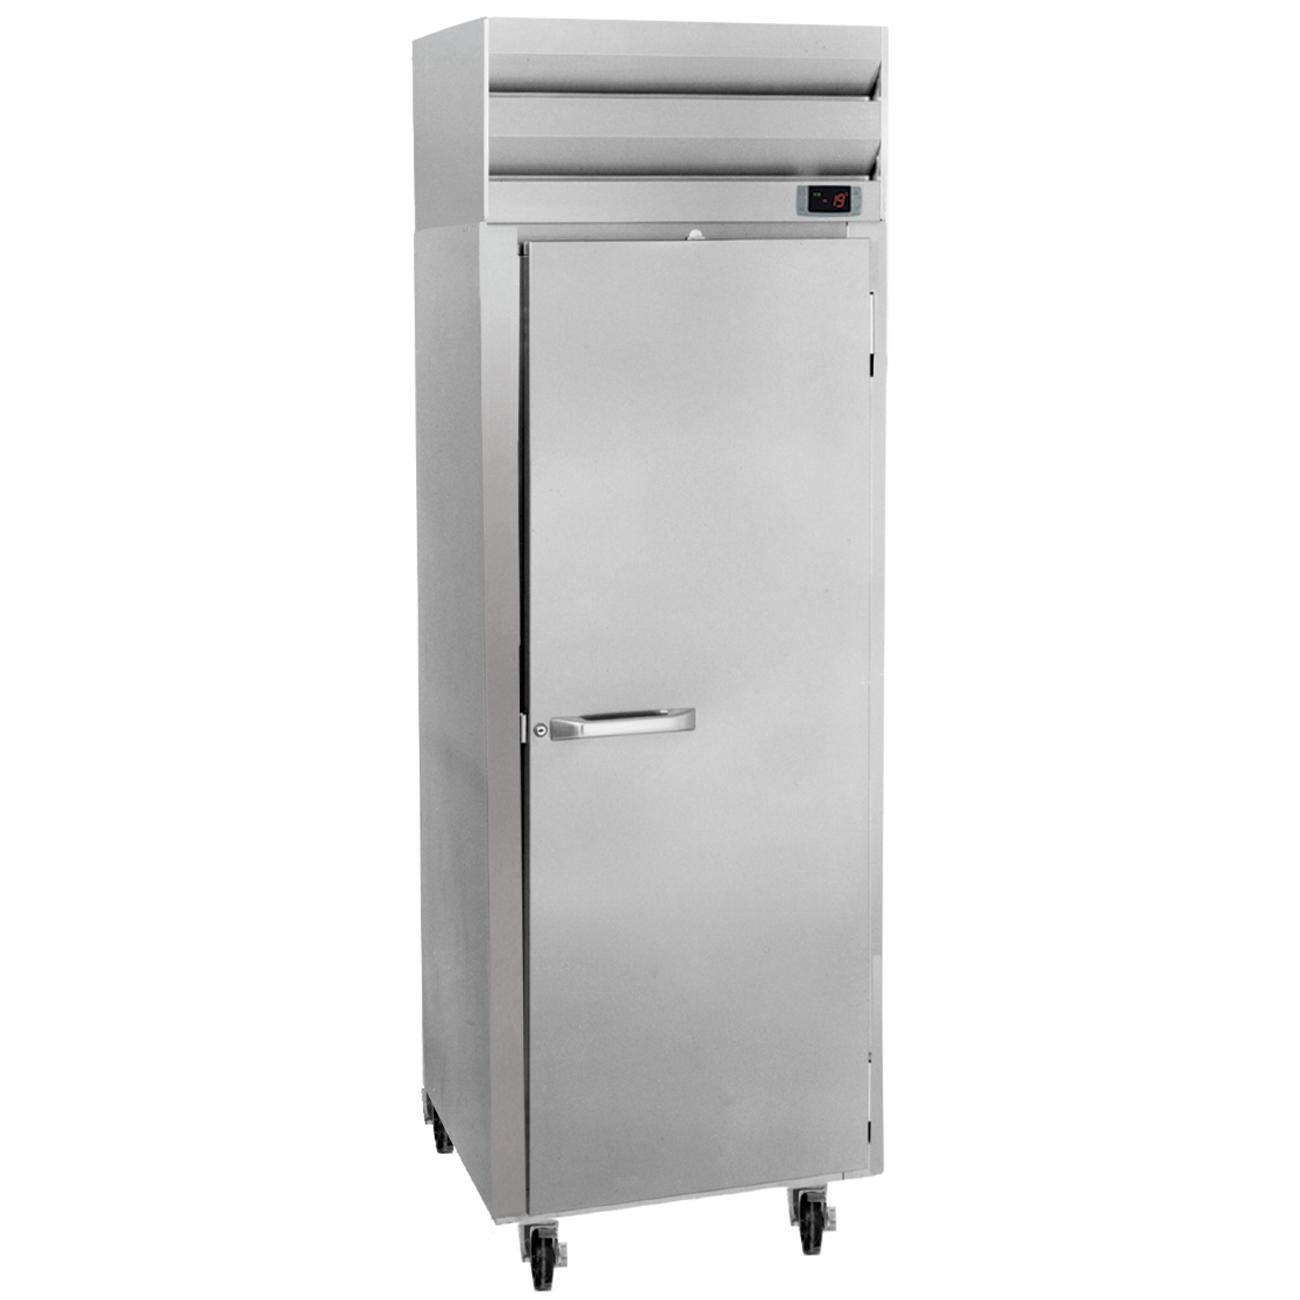 Howard-McCray SR22-S refrigerator, reach-in